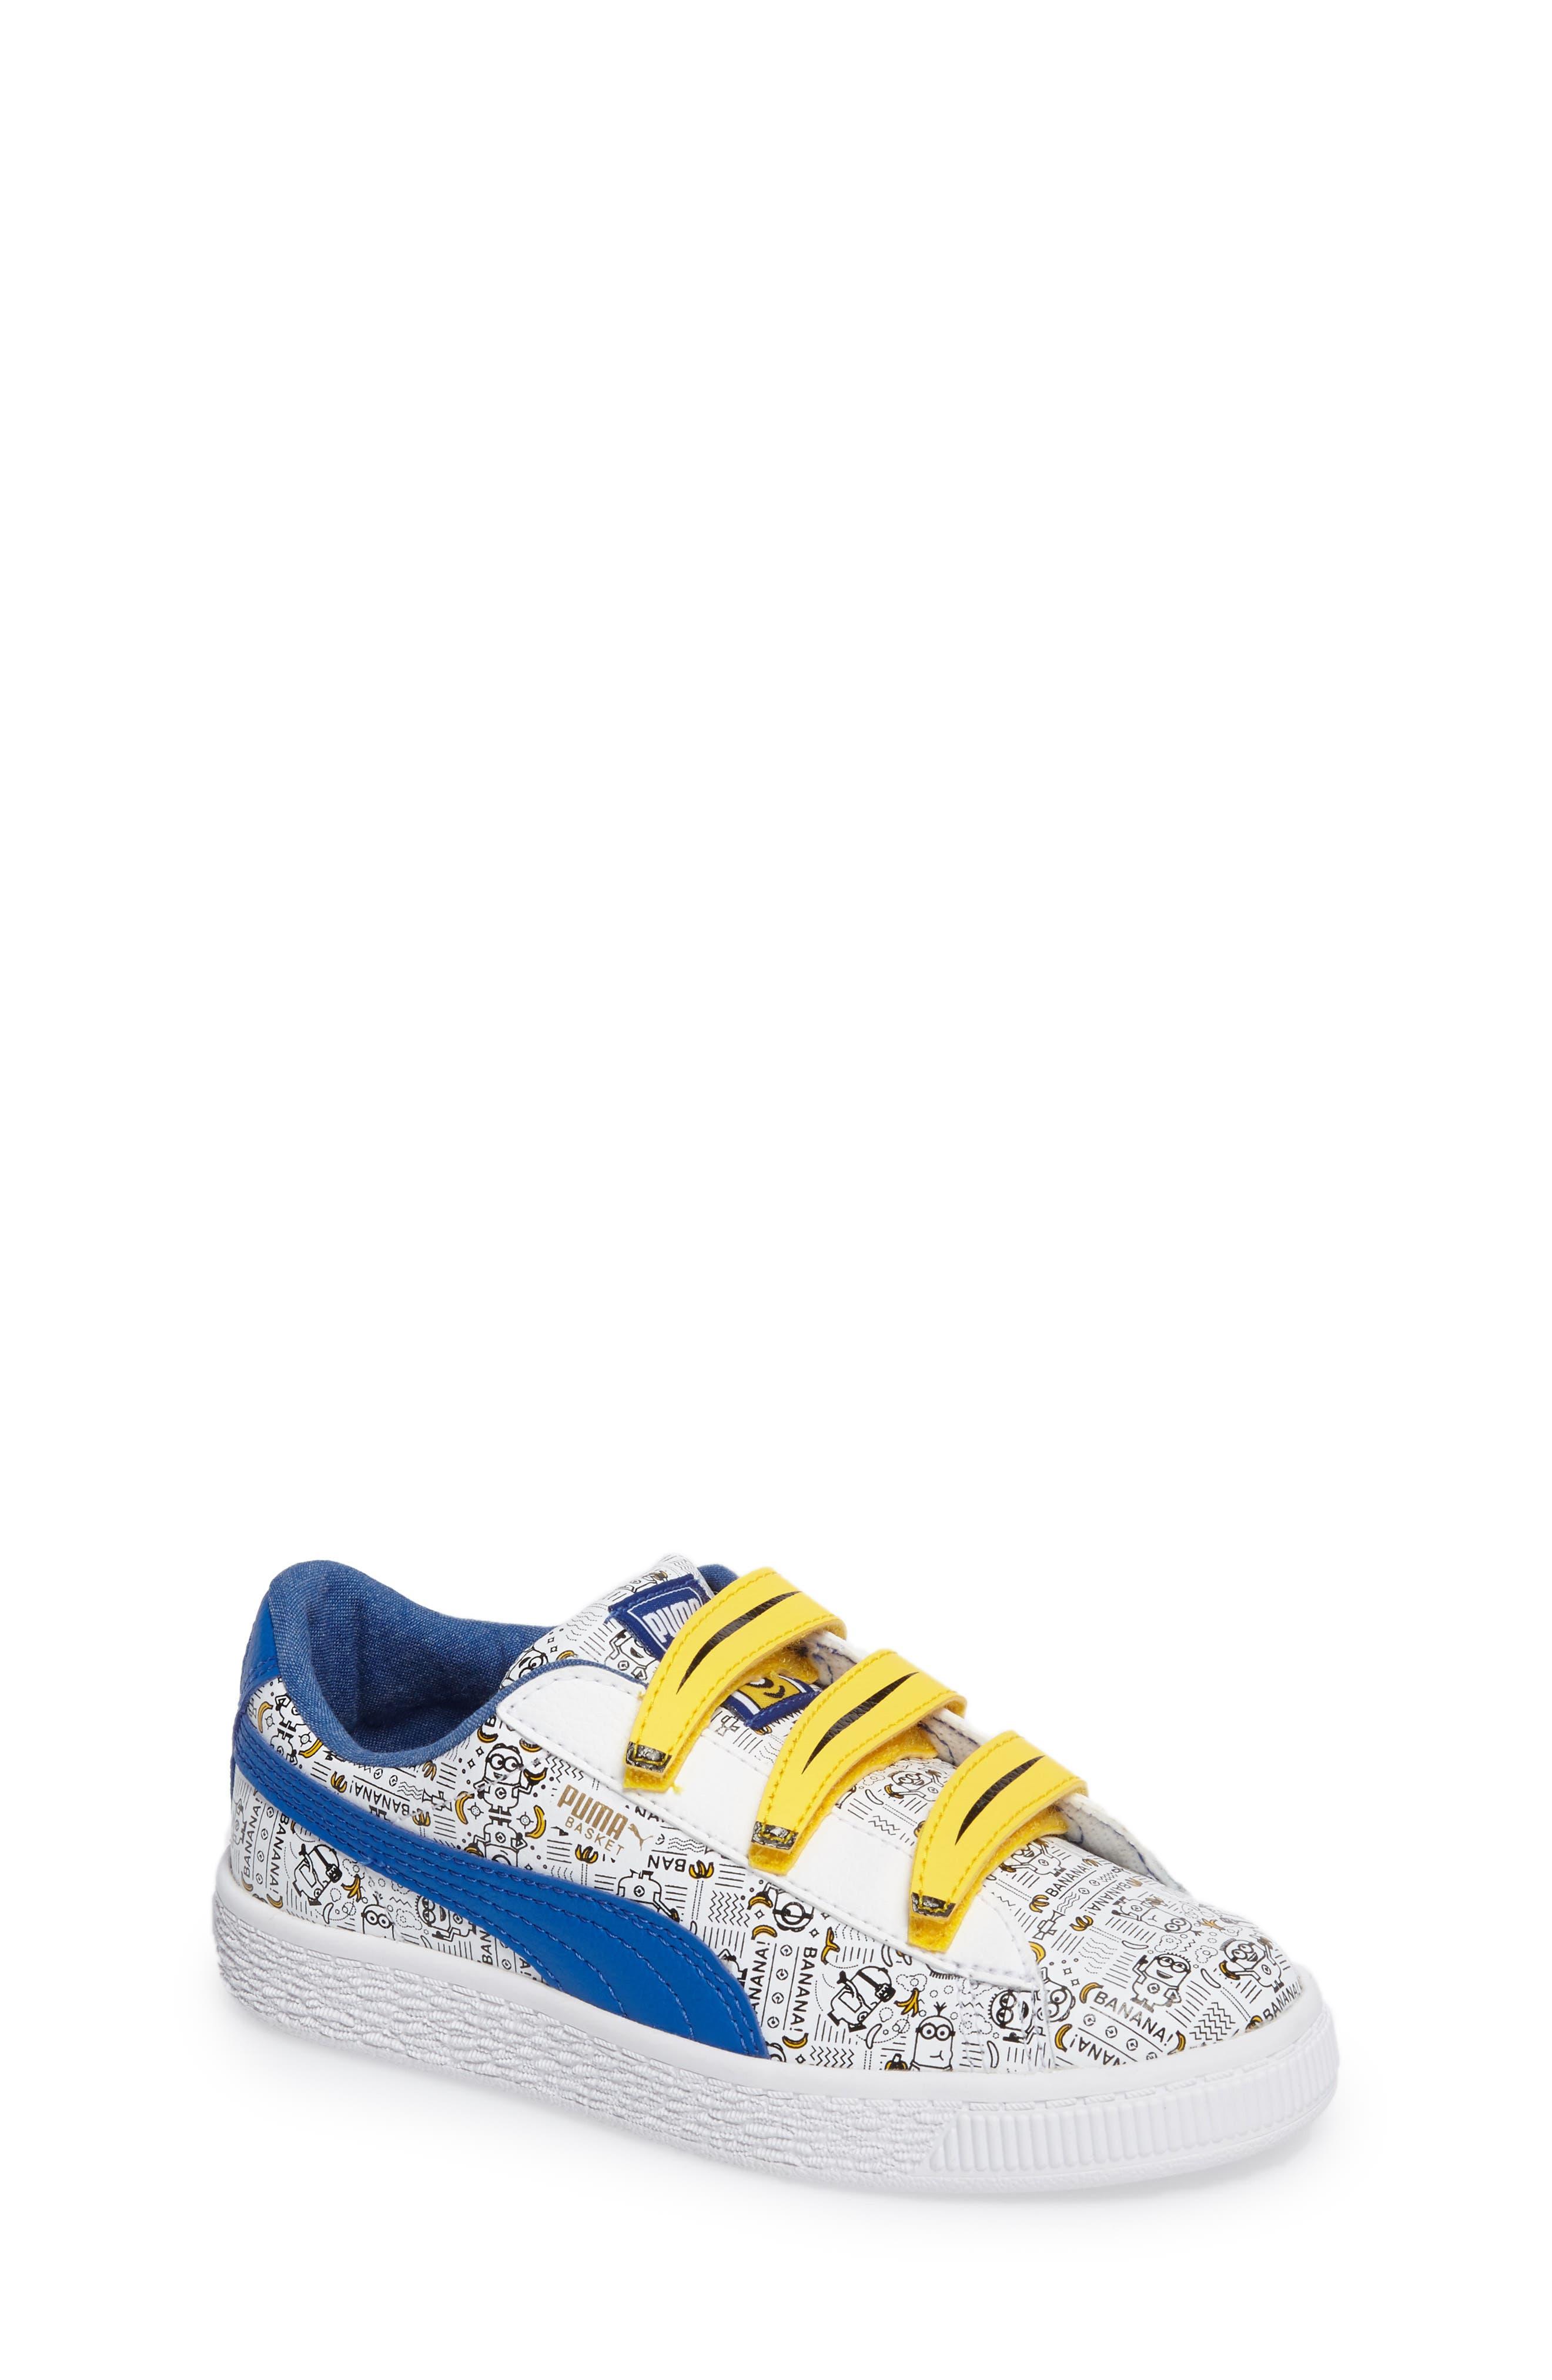 Alternate Image 1 Selected - PUMA Minions Basket V Sneaker (Toddler, Little Kid & Big Kid)